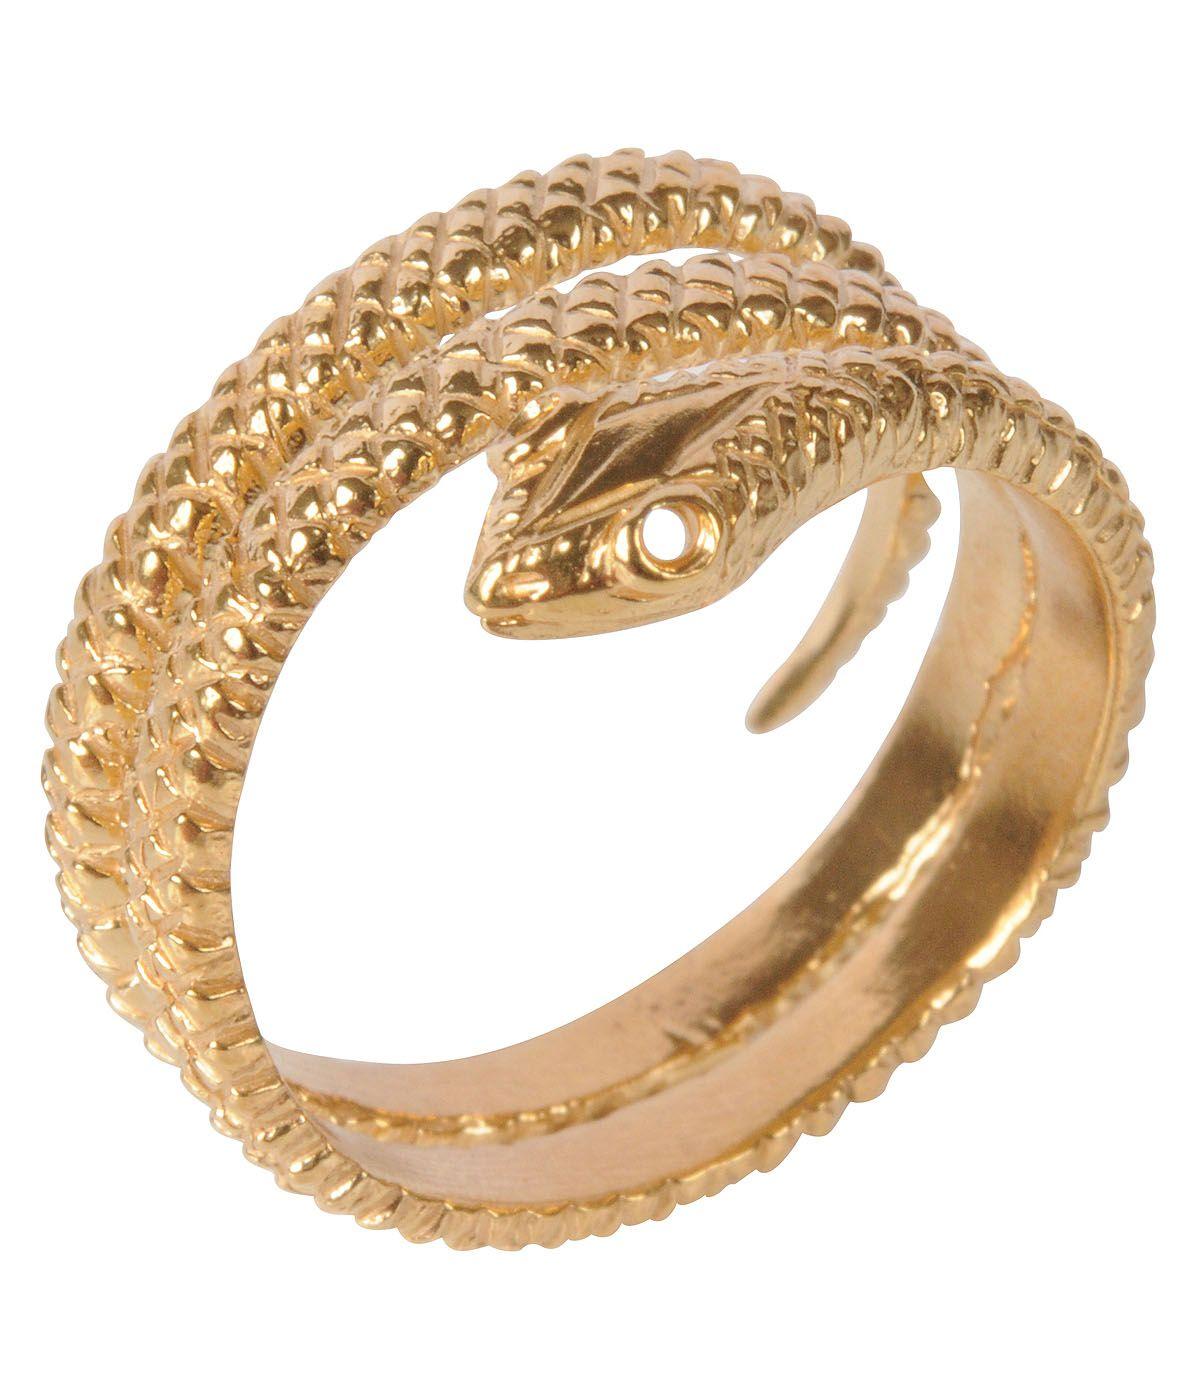 Mirabellle Jewellery Ltd: British Made Snake ring 22 Carat on Brass. Member Stand Number: Z24